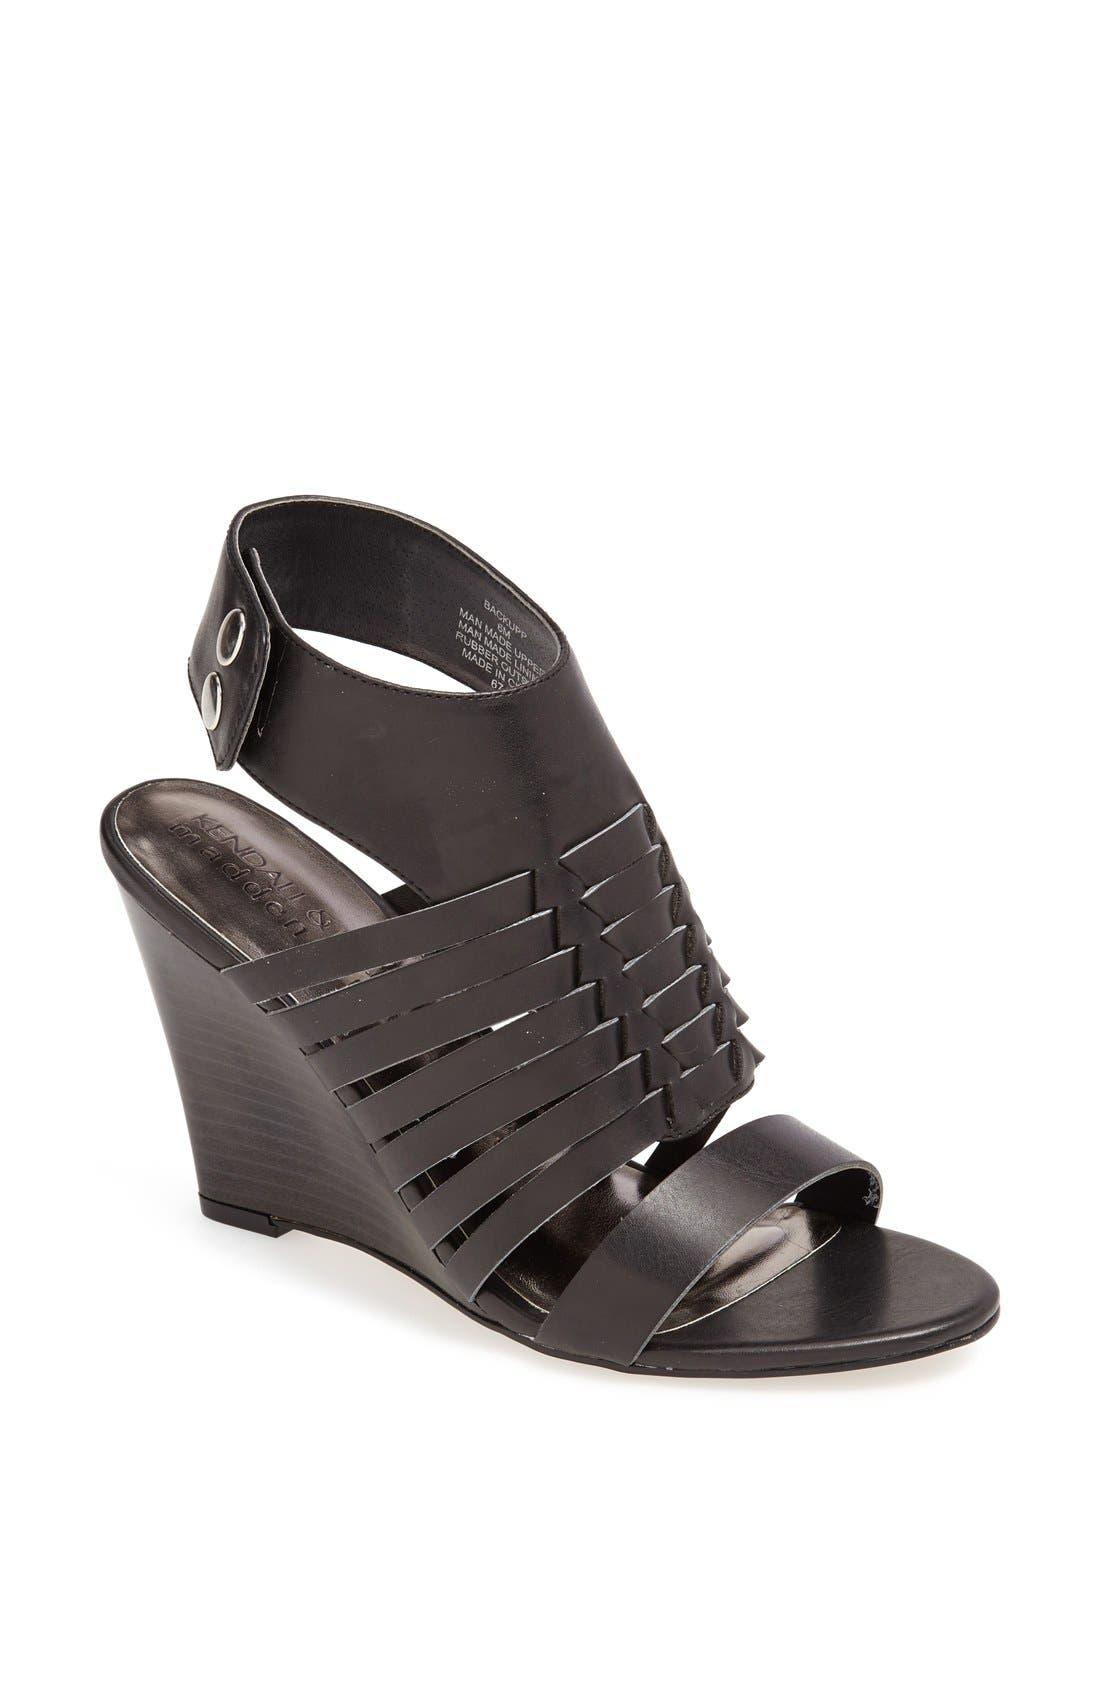 Alternate Image 1 Selected - KENDALL + KYLIE Madden Girl 'Backupp' Ankle Cuff Sandal